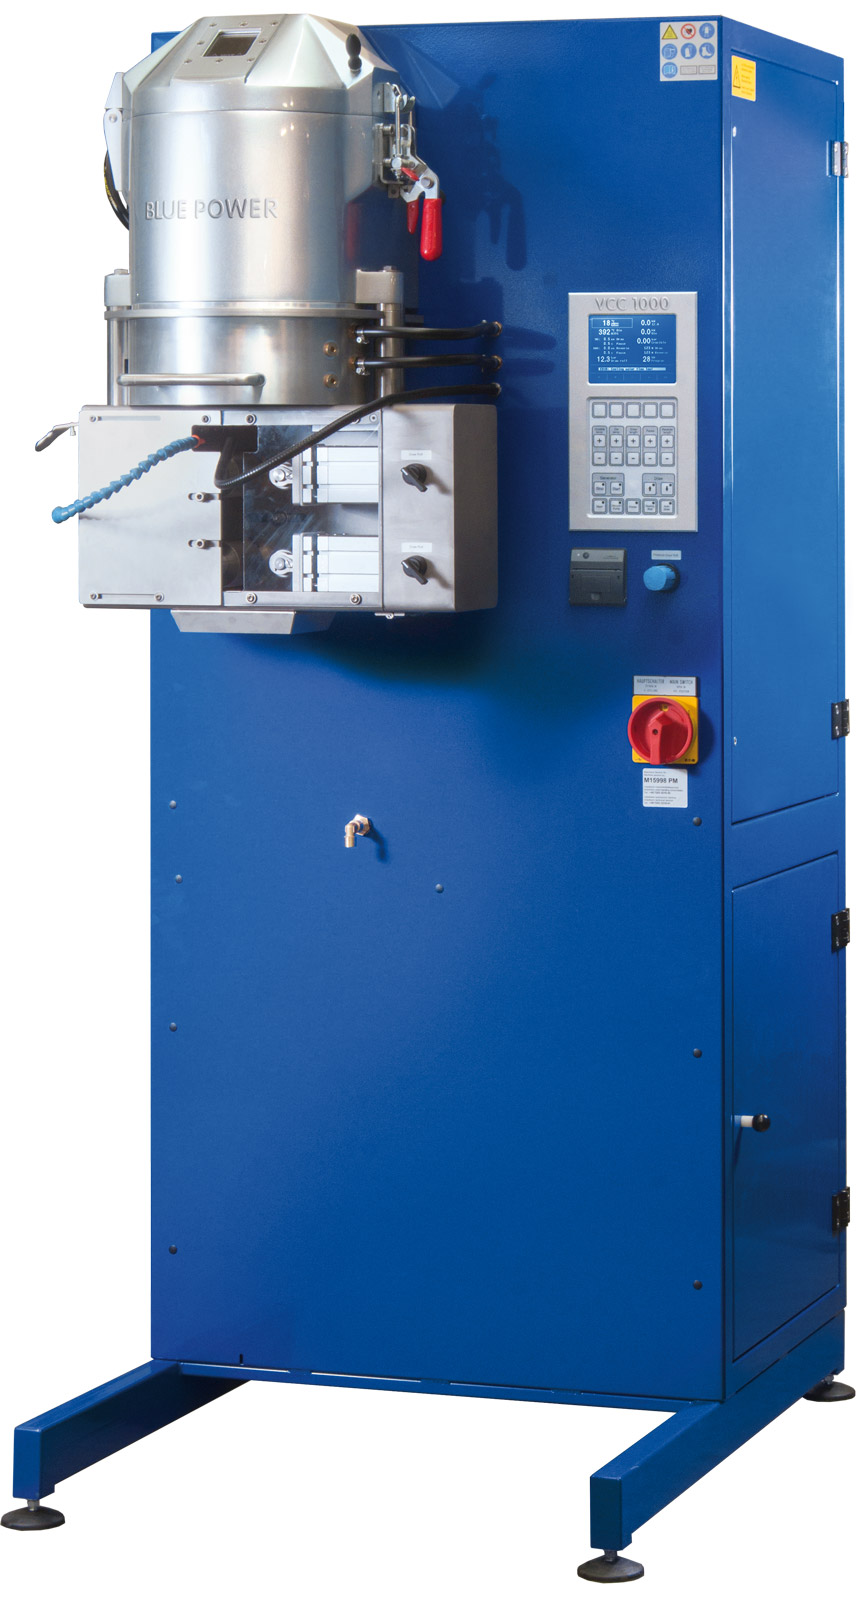 Stranggießanlage CC 1000 / VCC 1000